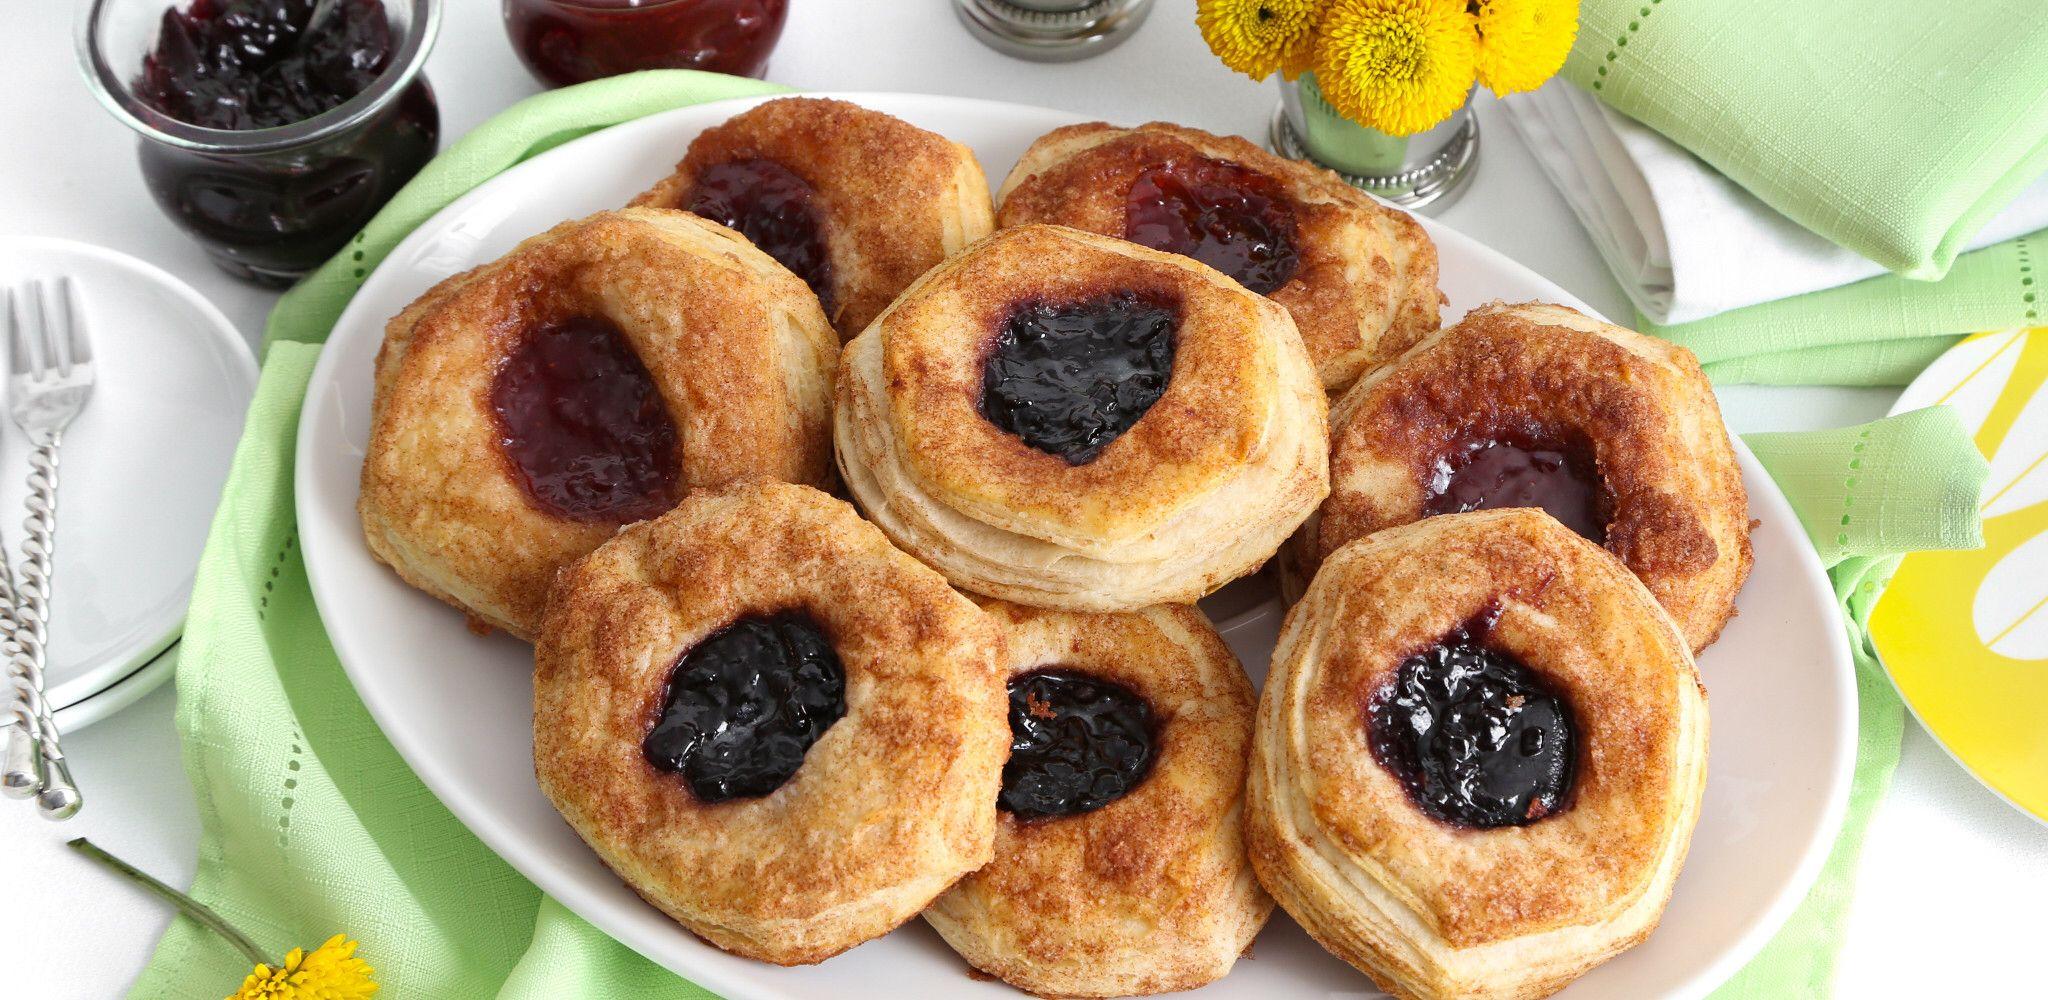 Jam Filled Biscuits Recipe Food Network Recipes Biscuit Recipe Fake Bake